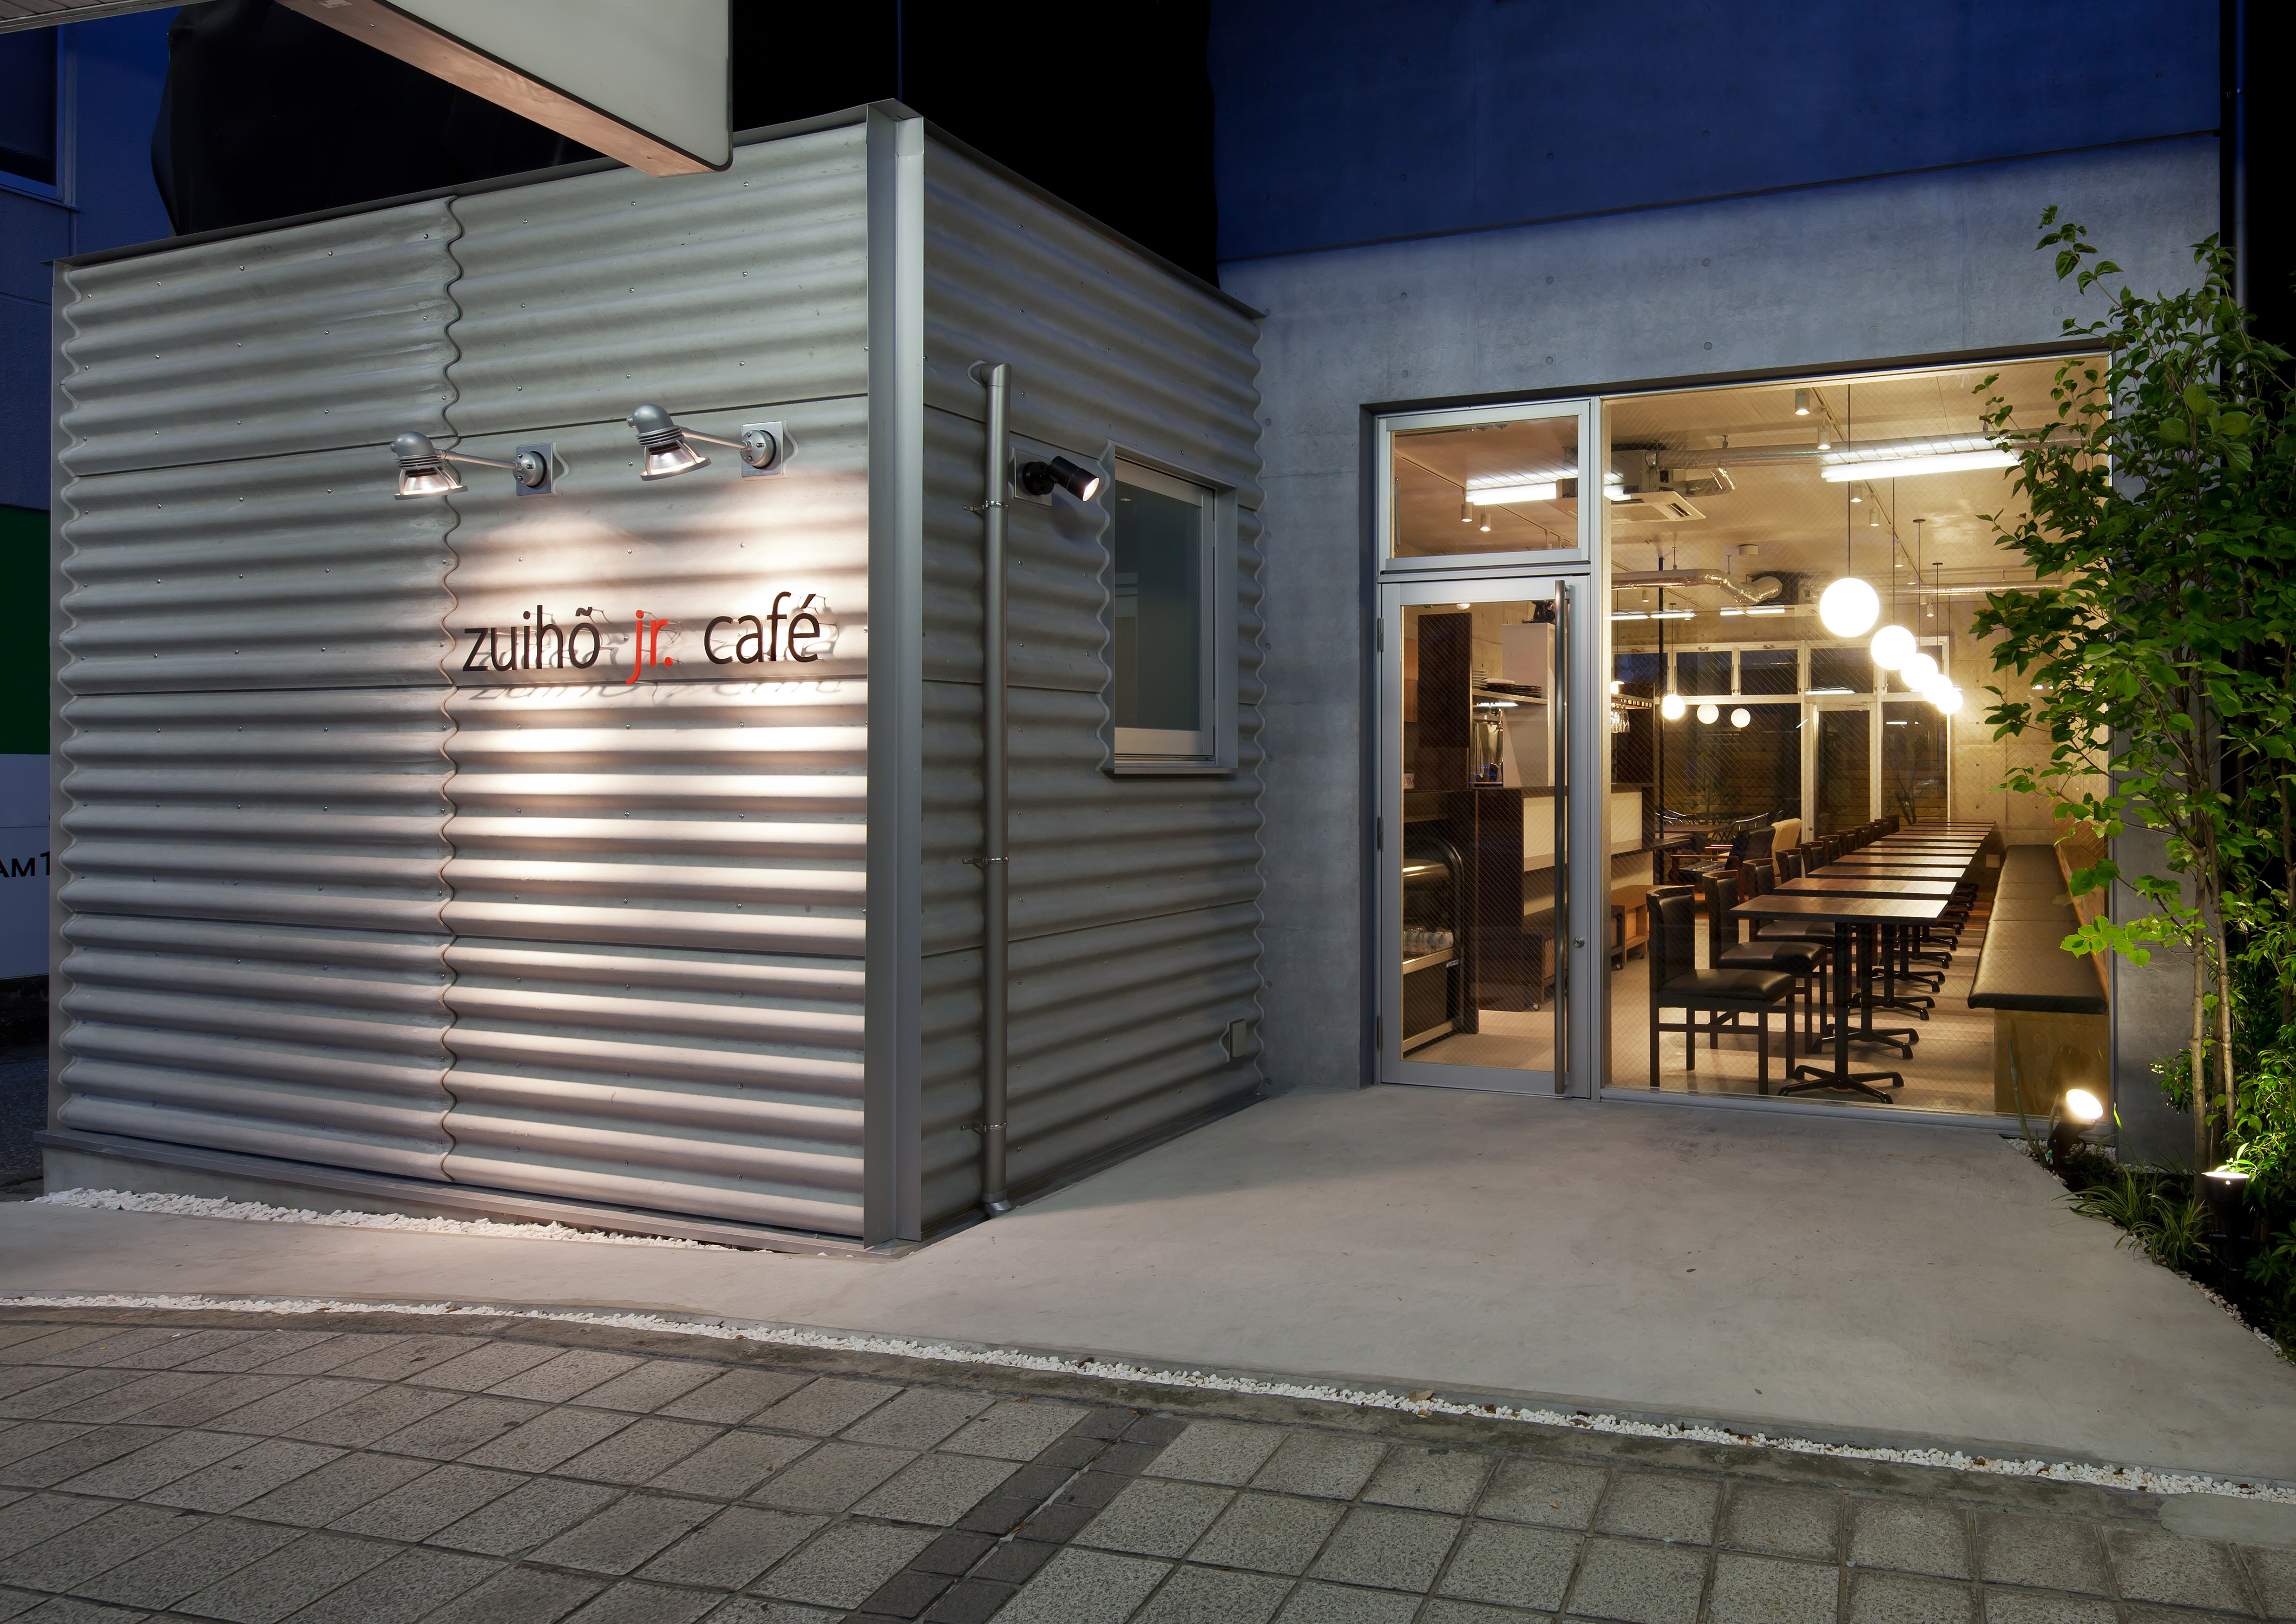 zuiho jr. cafe(滋賀県彦根市)〈建築プロデュース〉